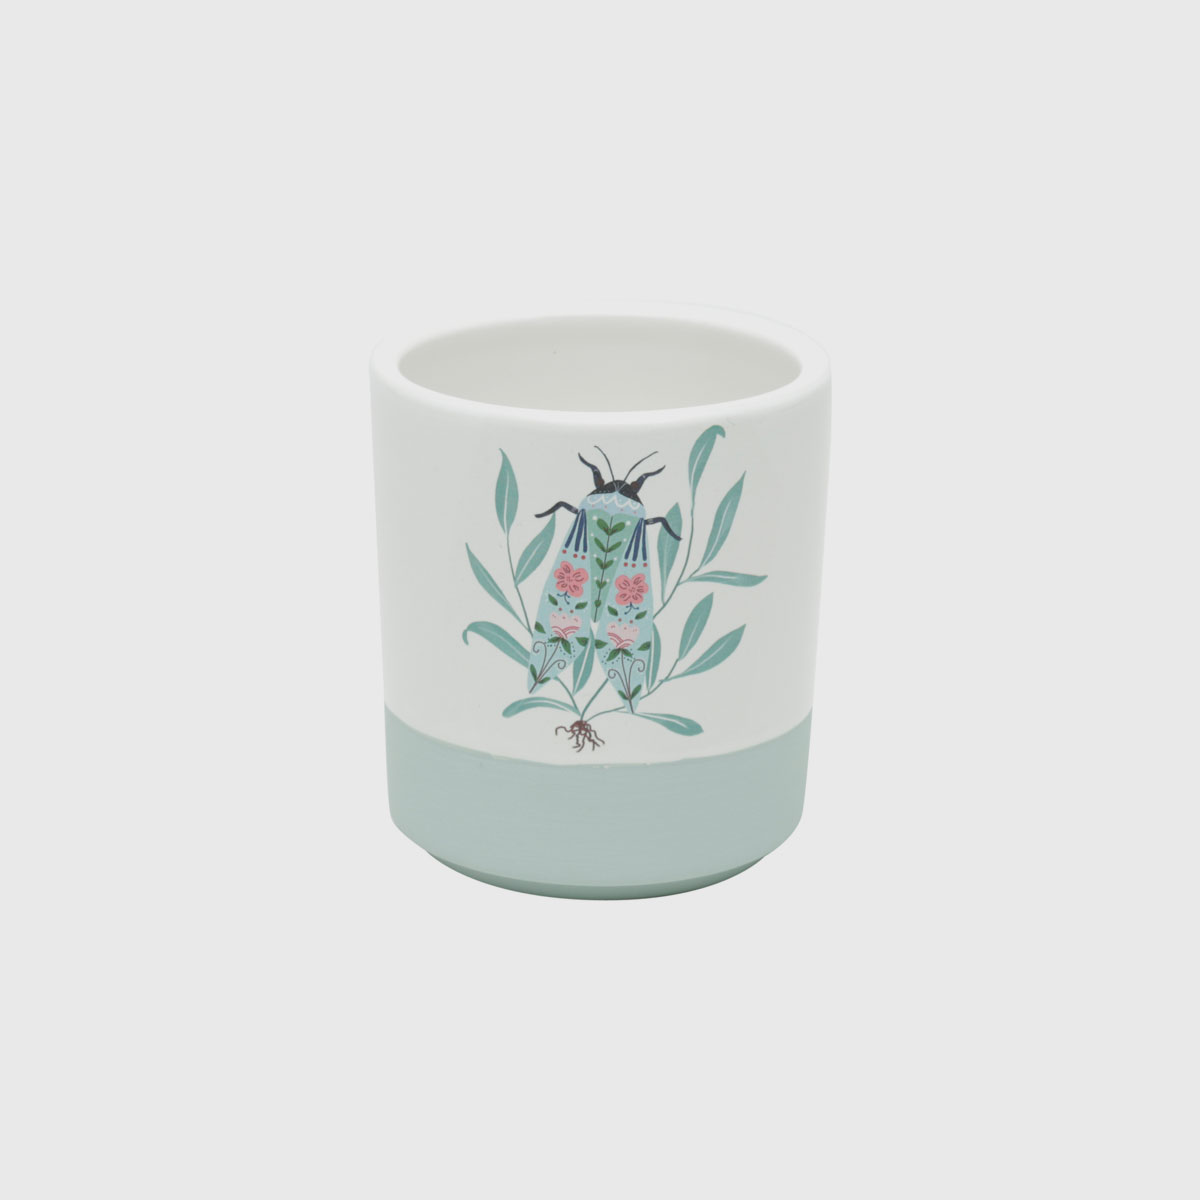 Vaso cerâmica fly